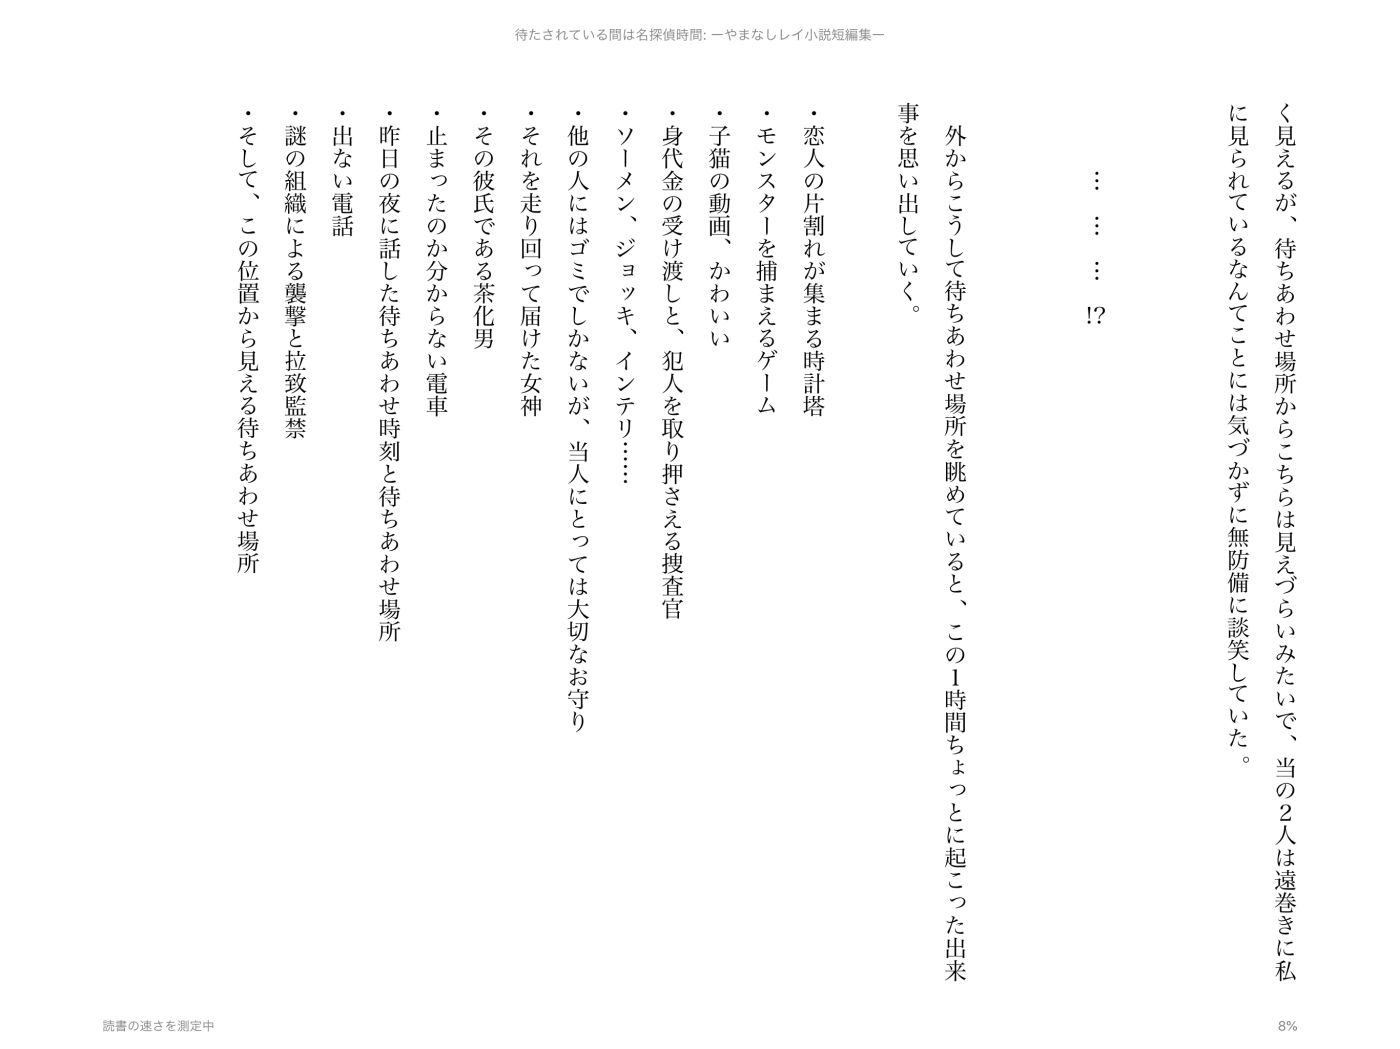 iOSban2.jpg